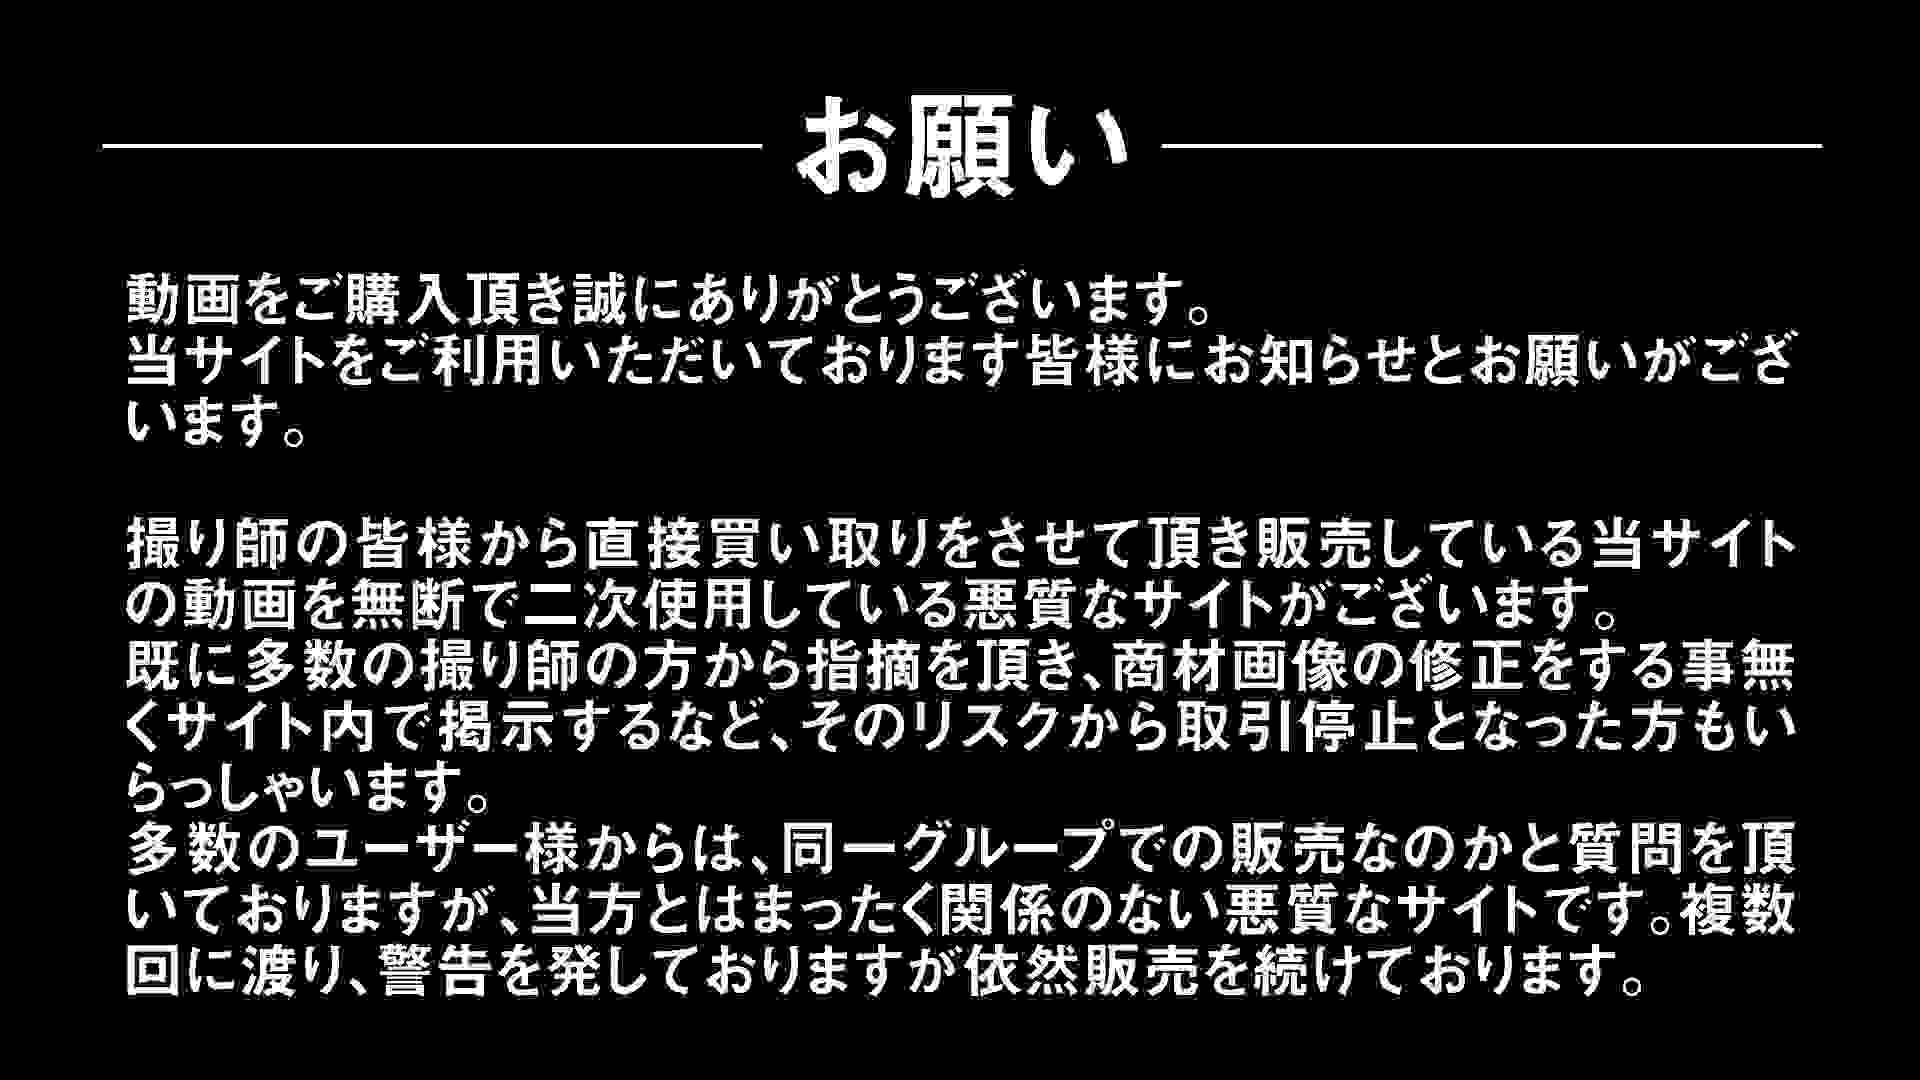 Aquaな露天風呂Vol.300 盗撮シリーズ | 露天風呂編  110PIX 29